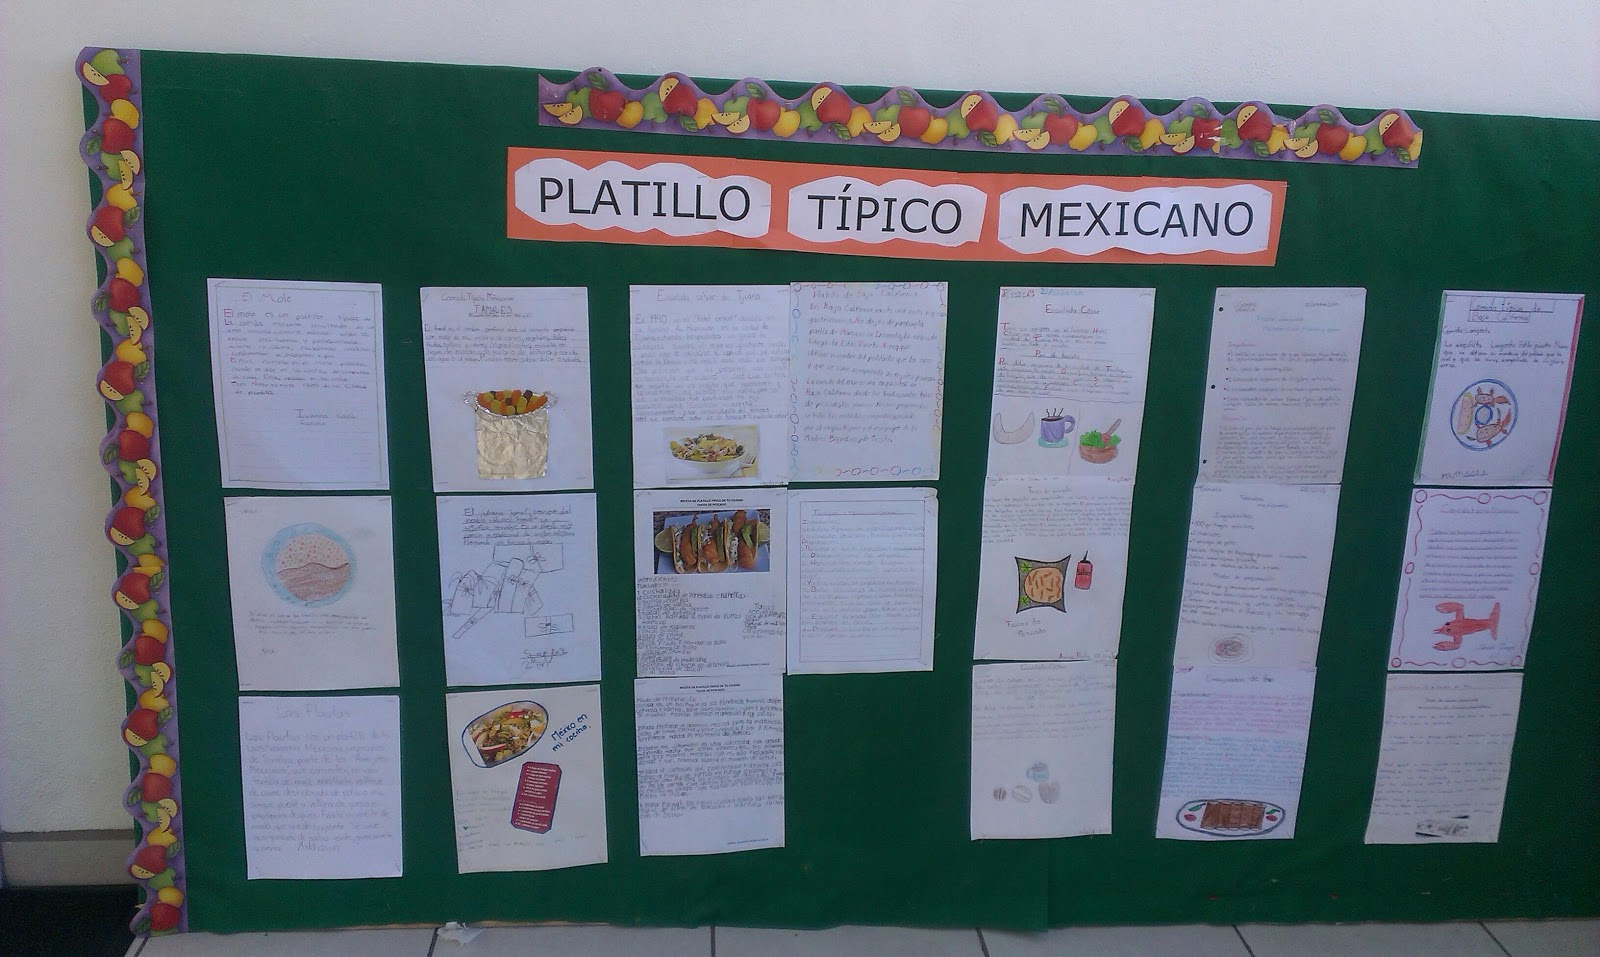 Peques club peri dico mural sobre comidas t picas for Estructura de un periodico mural escolar